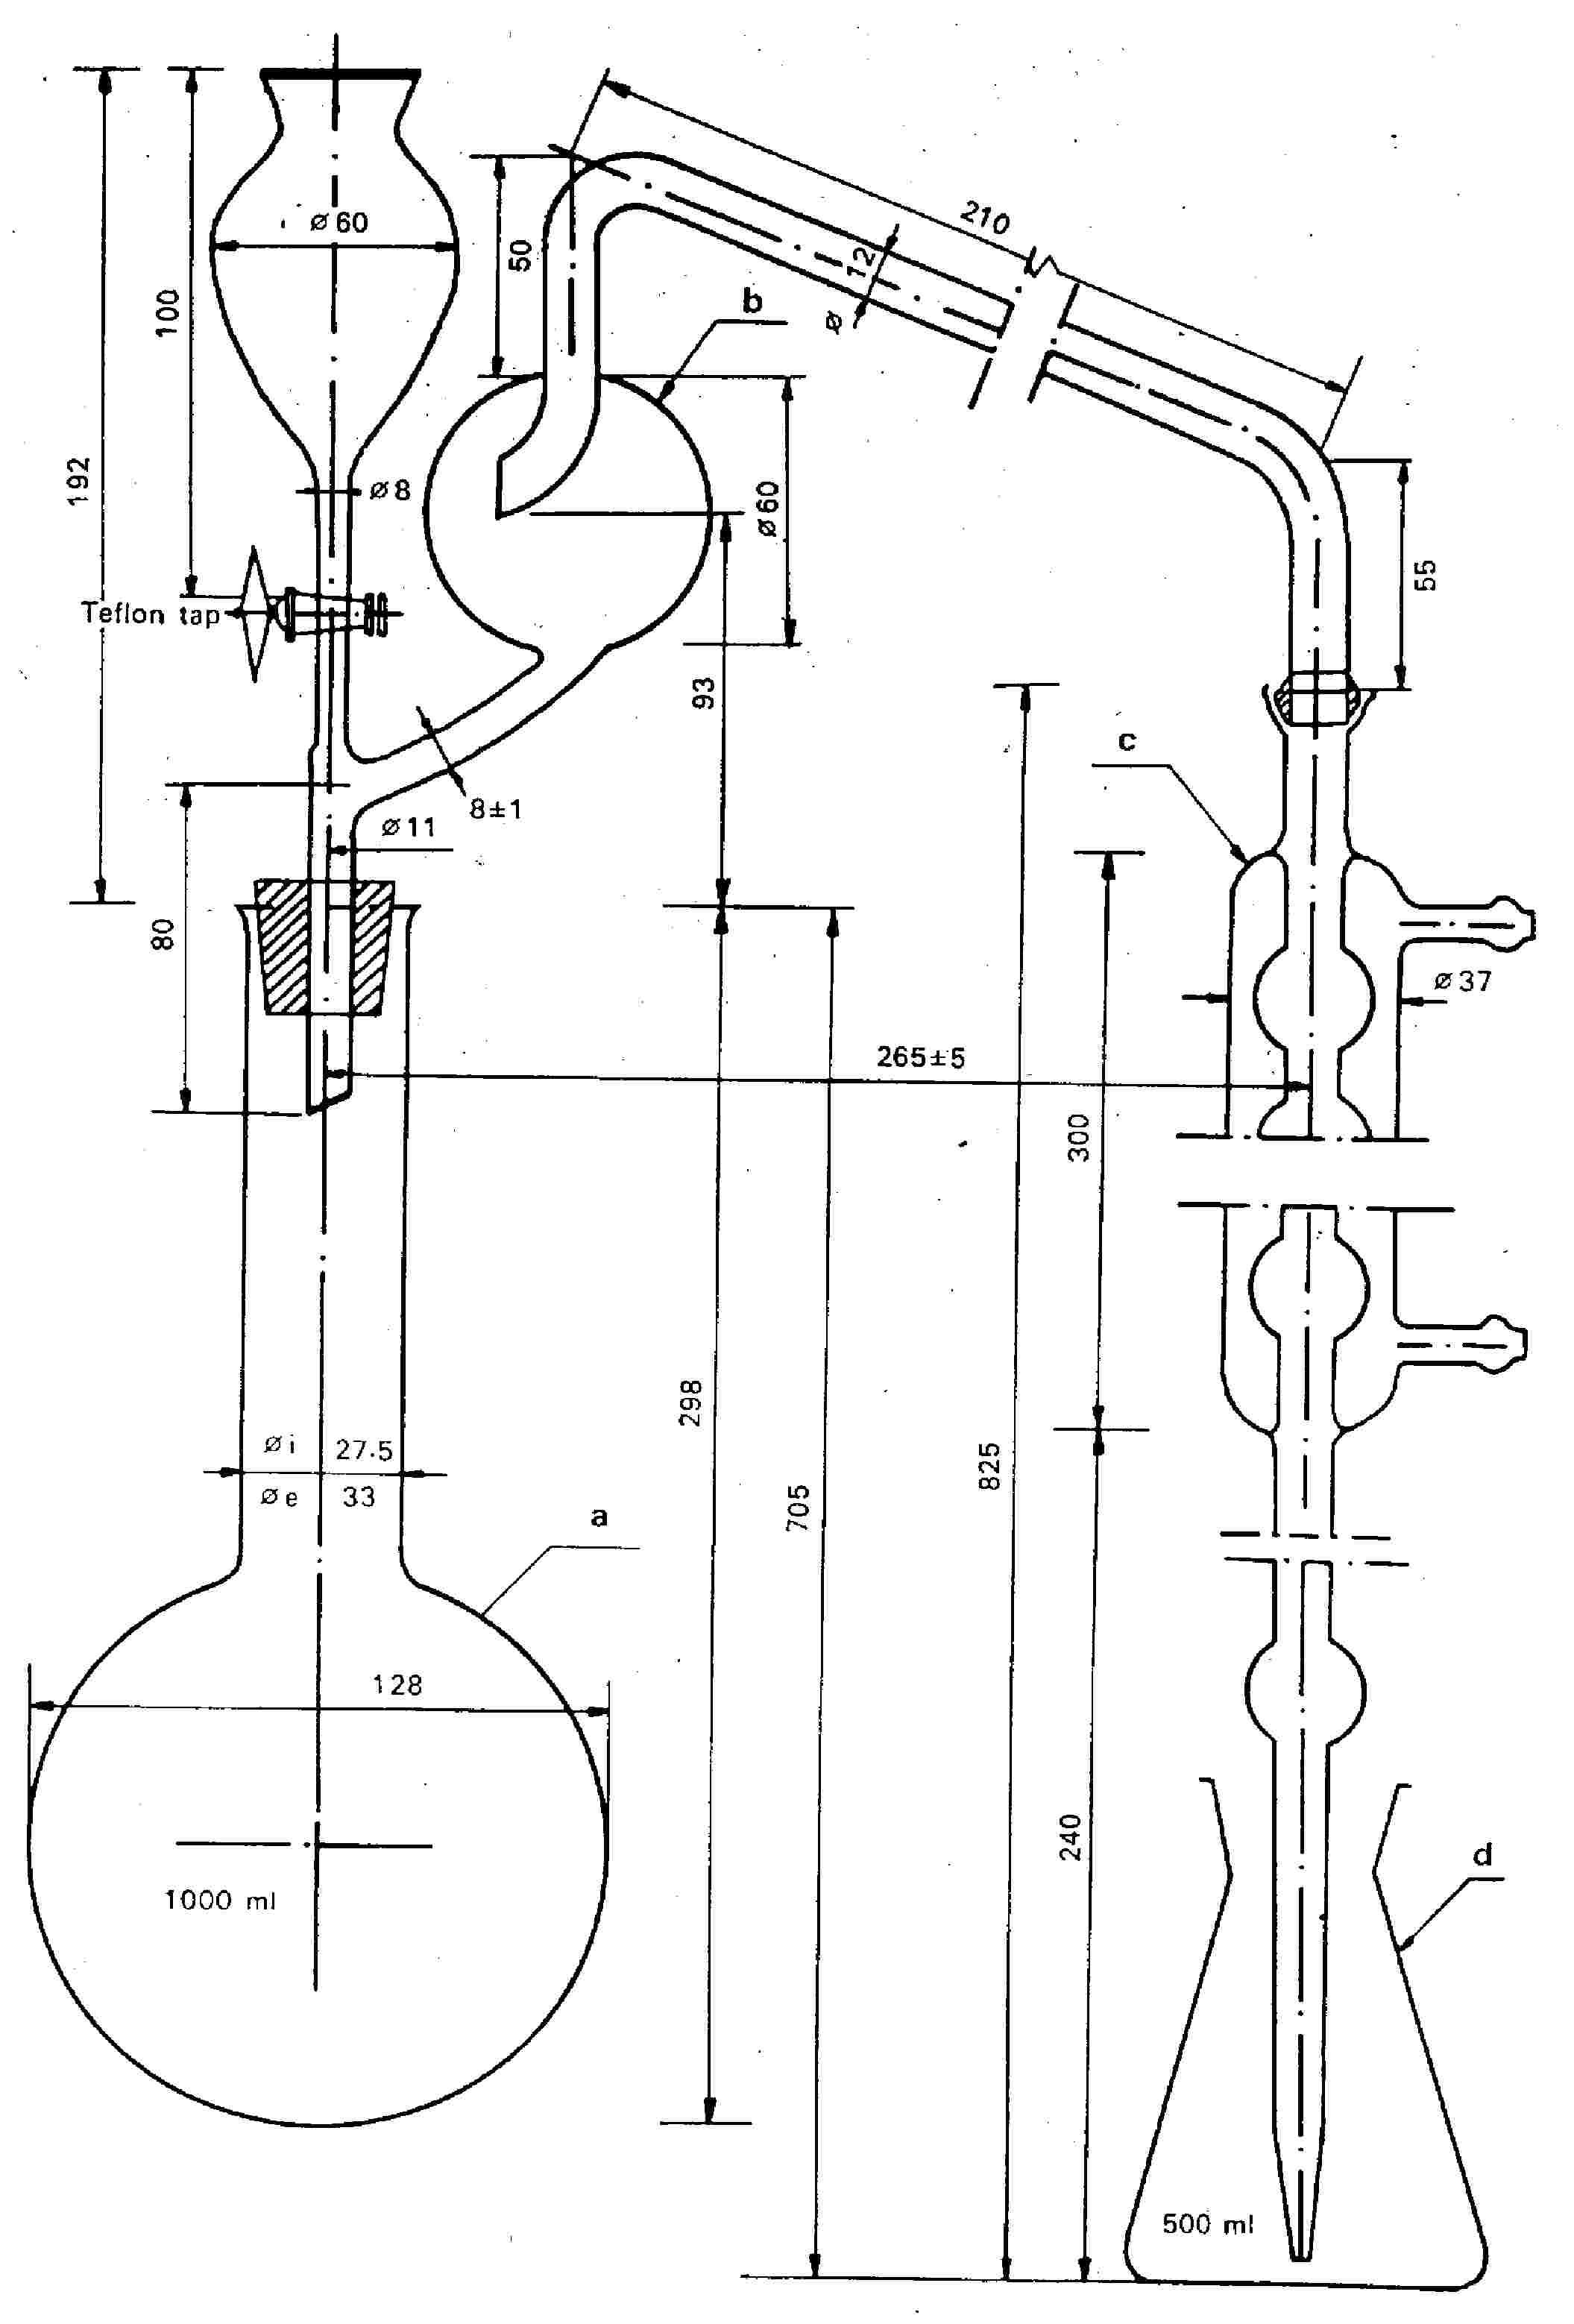 Eur Lex 02003r2003 20090420 En Faucet Repair Parts Likewise Outdoor Diagram Furthermore Image